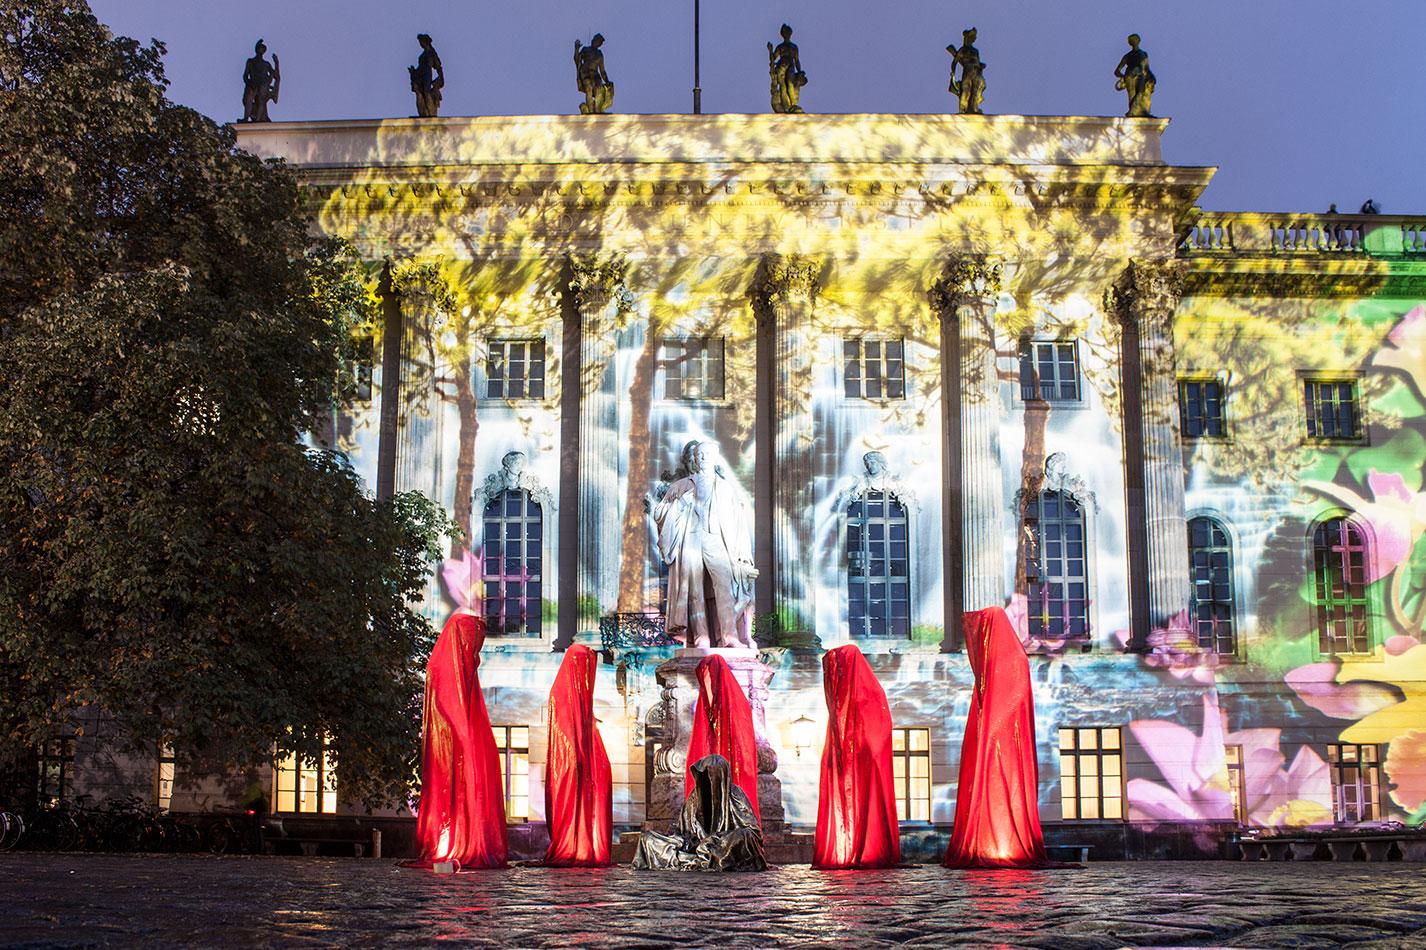 festival-of-lights-berlin-humbold-university-light-art-festival-contemporary-fine-art-design-show-guardiansof-time-manfred-kili-kielnhofer-sculpture-3558